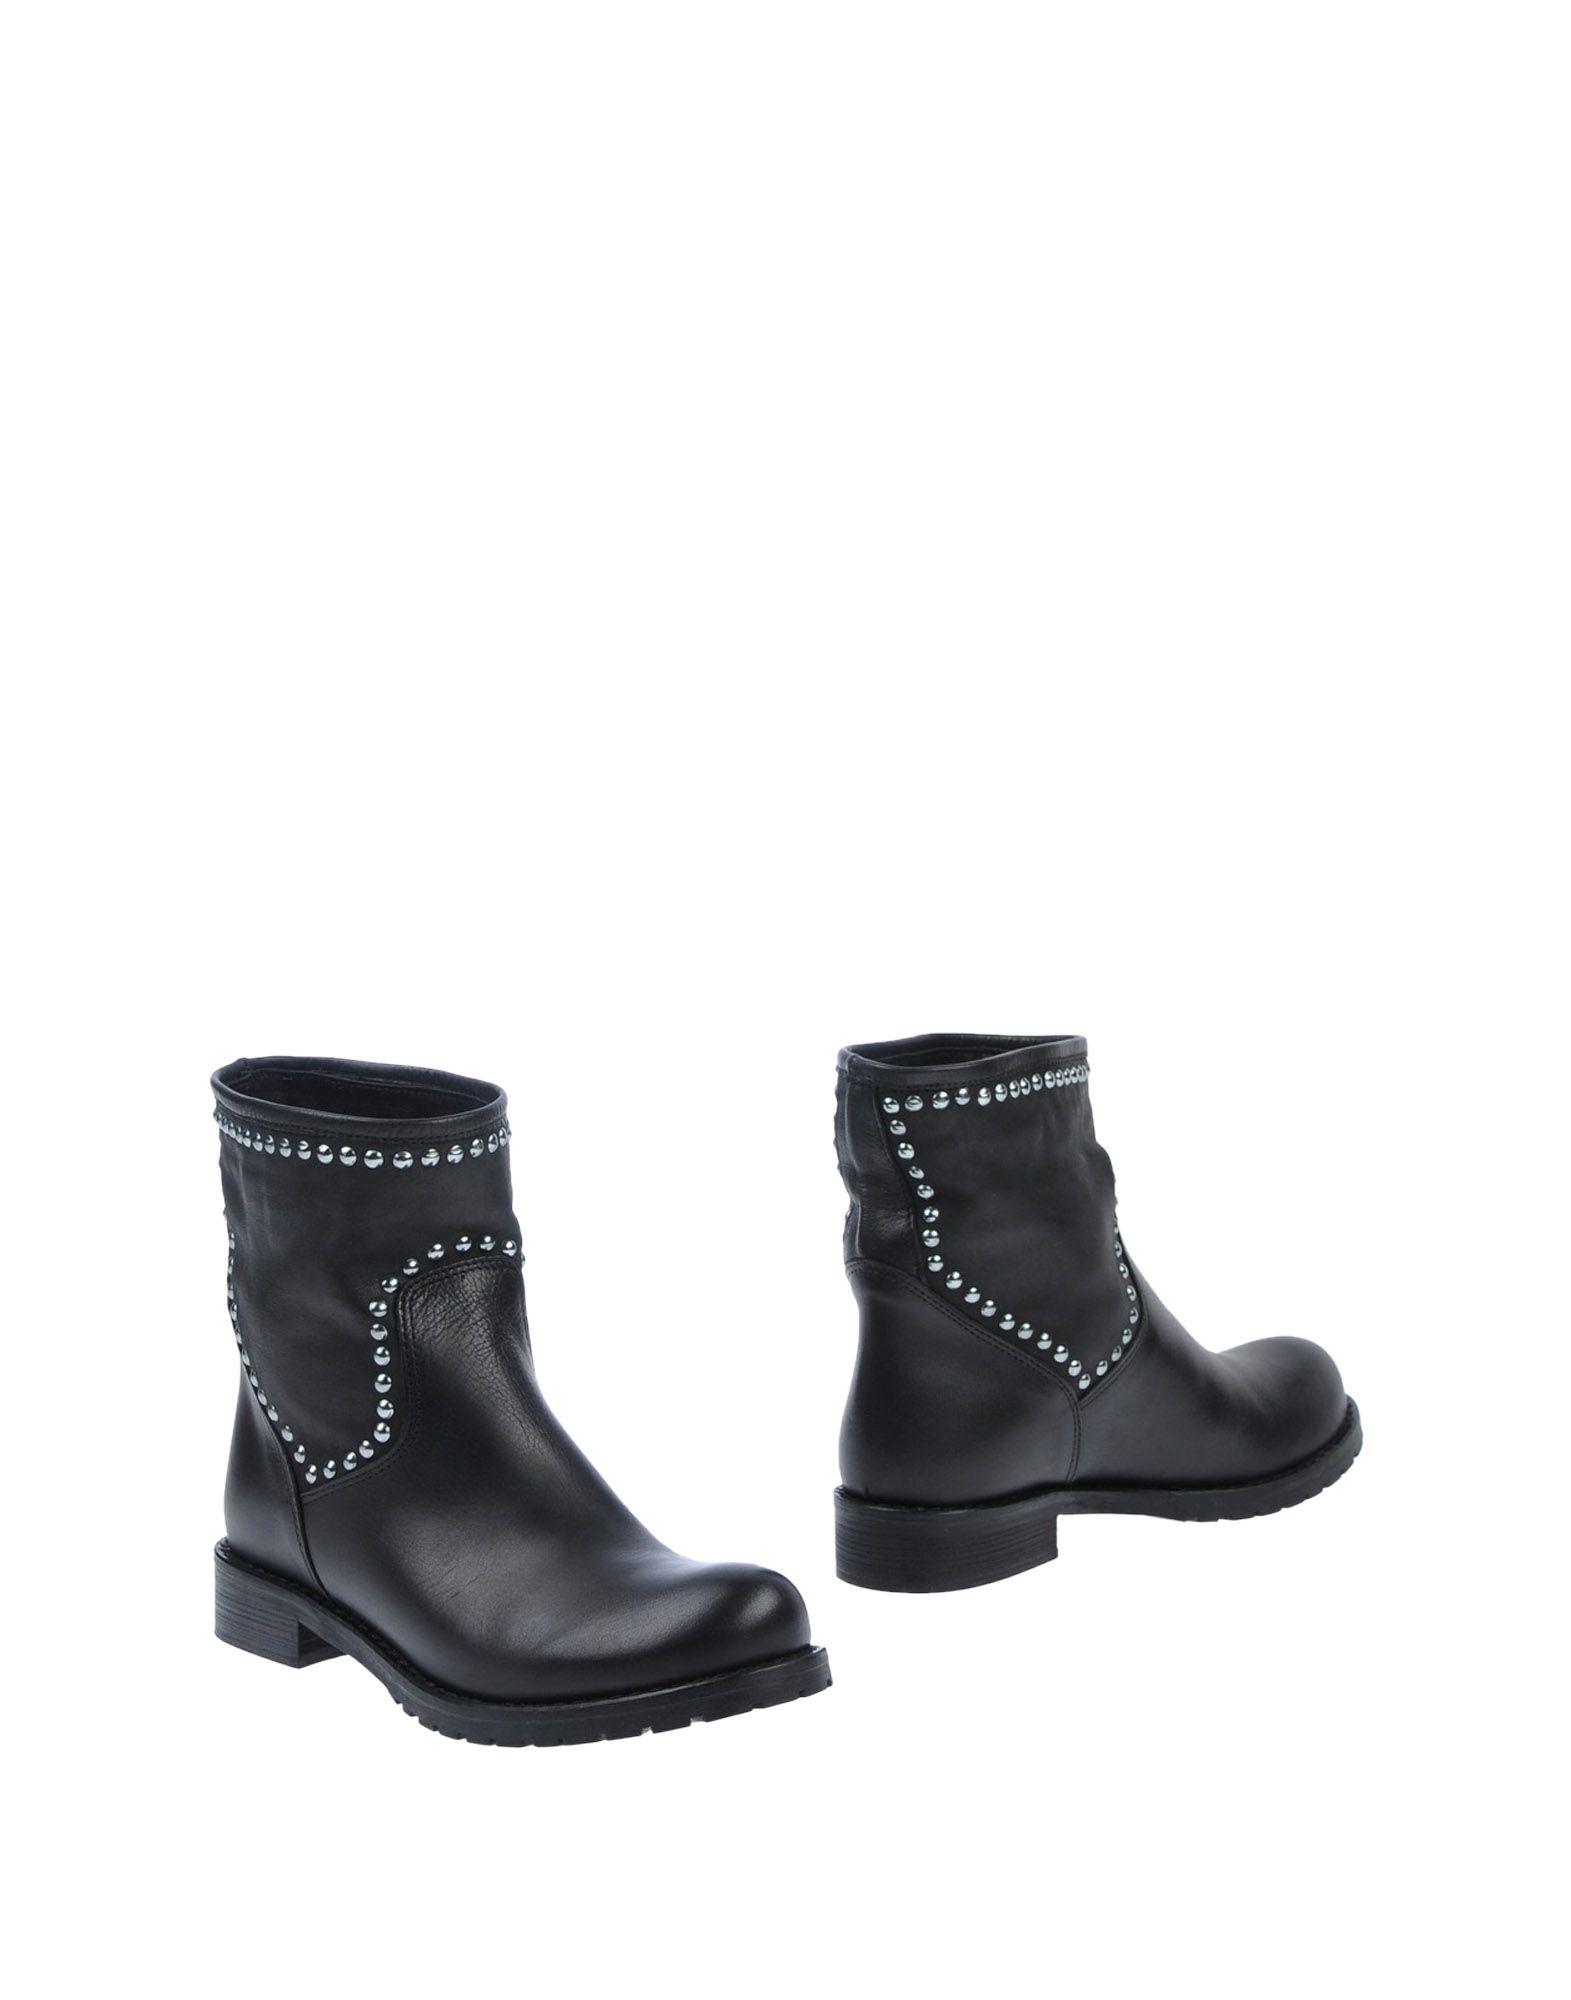 Mauro Fedeli Stiefelette Qualität Damen  11507356FI Gute Qualität Stiefelette beliebte Schuhe 347ed6